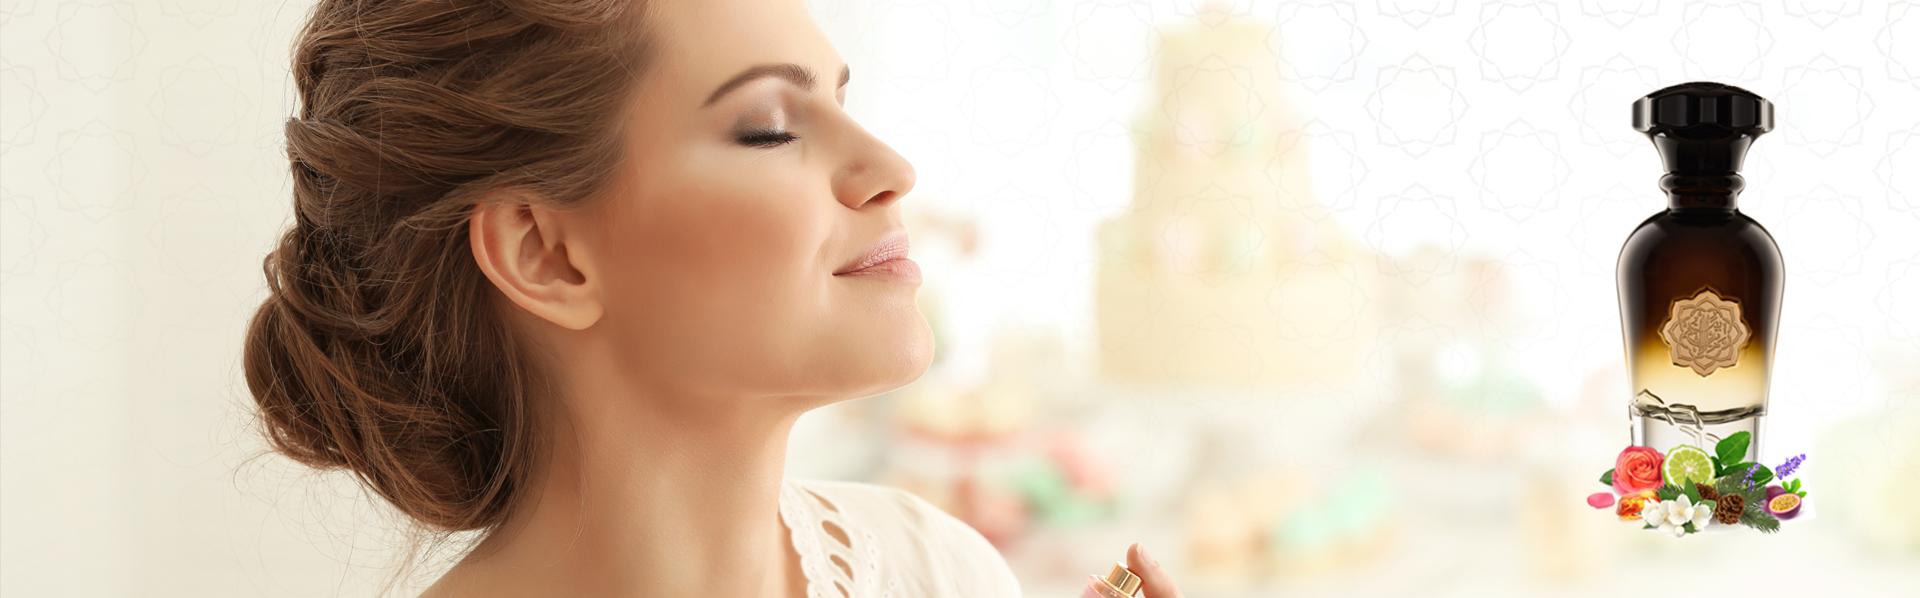 Best-Top-Branded-Perfumes-for-Woman-Online-Dubai-UAE